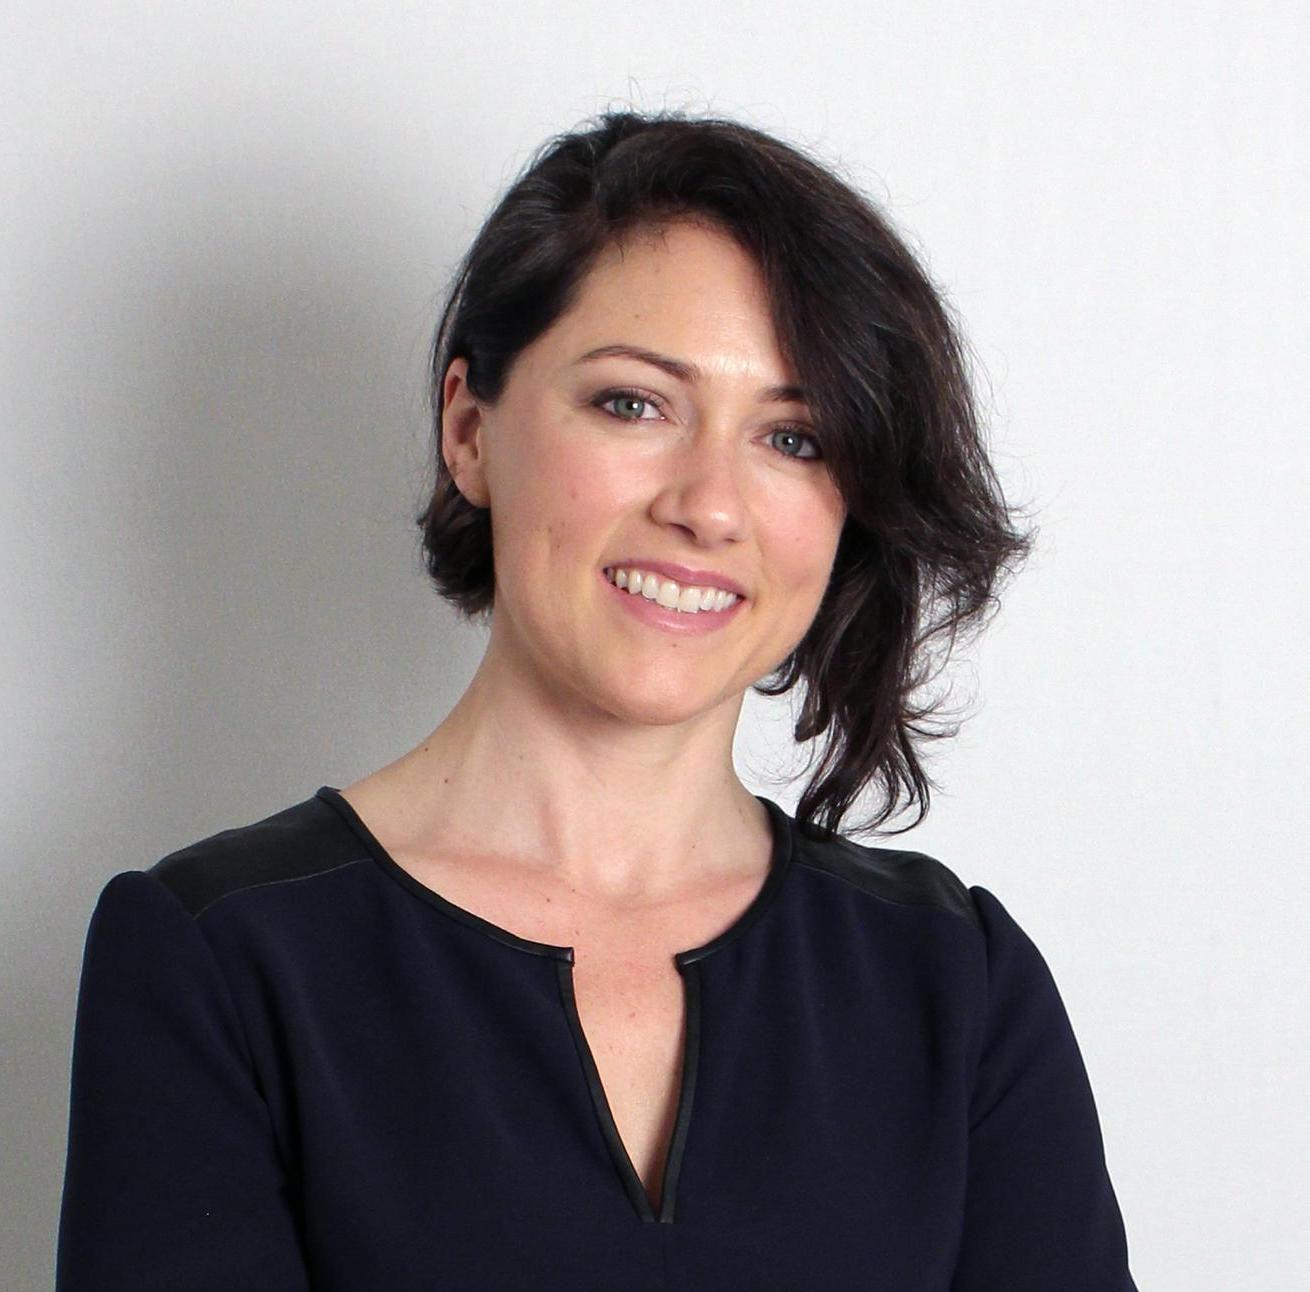 Alexis McGuffin